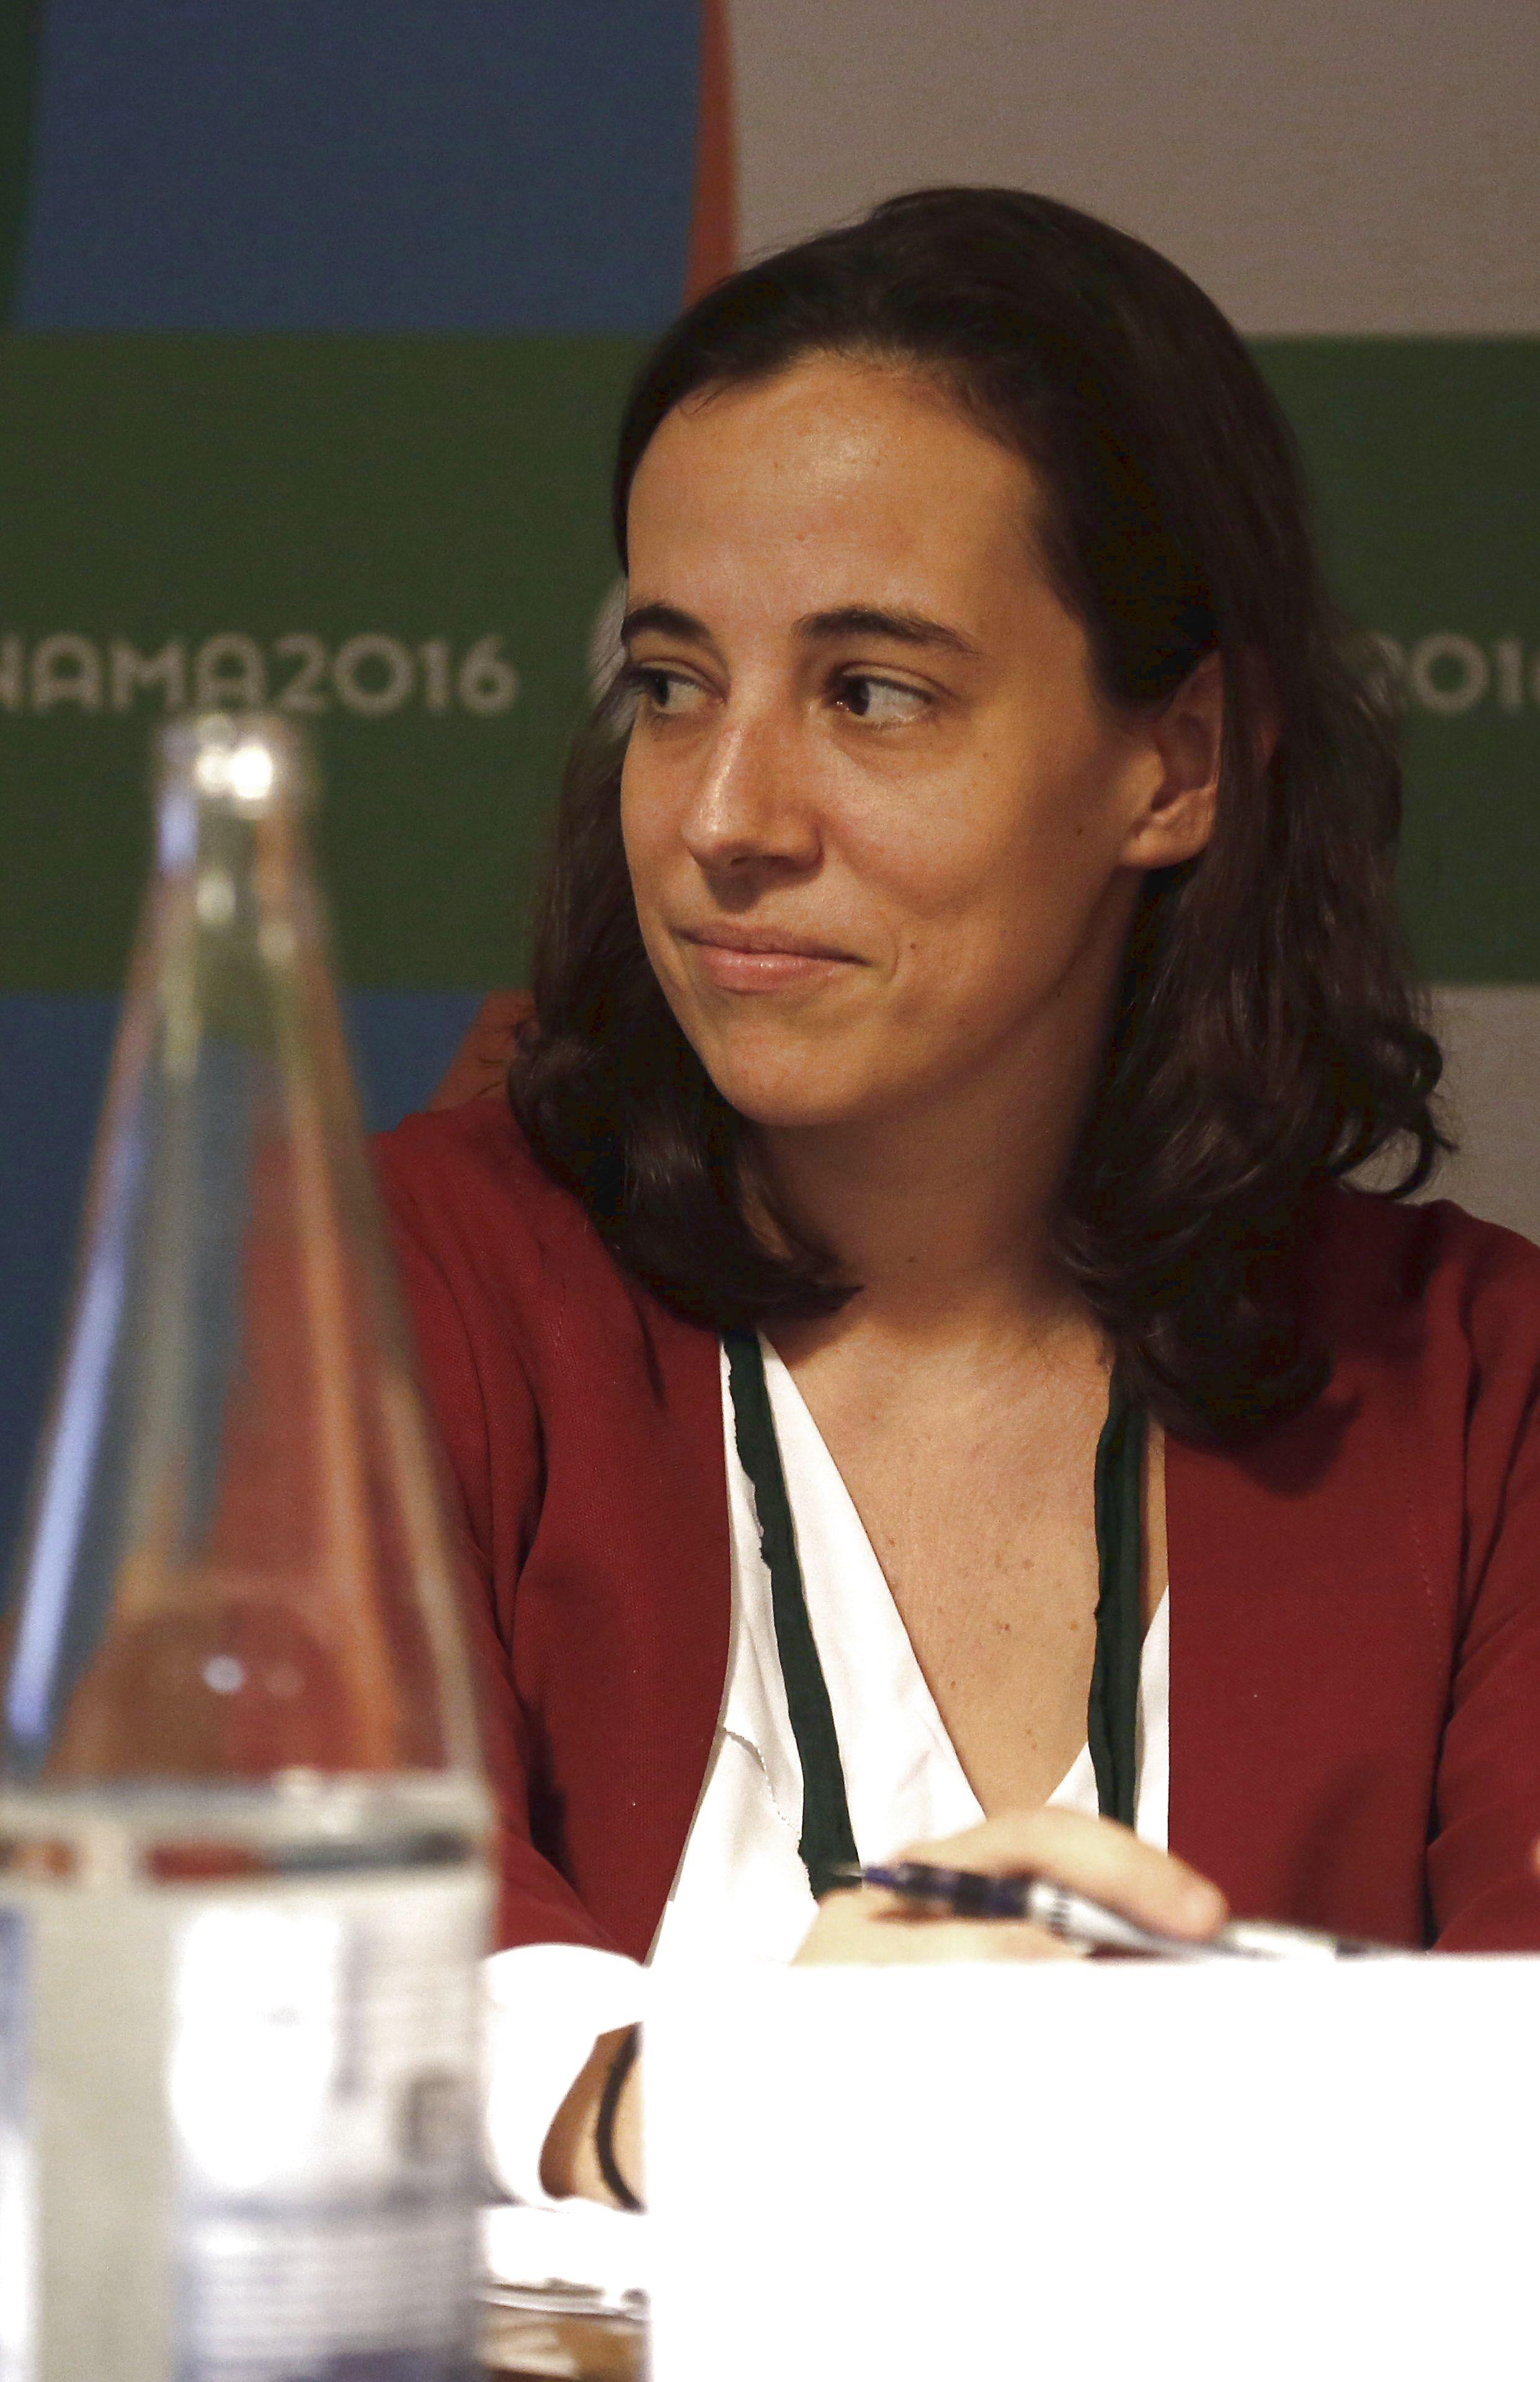 Teresa Solana Mendez de Vigo